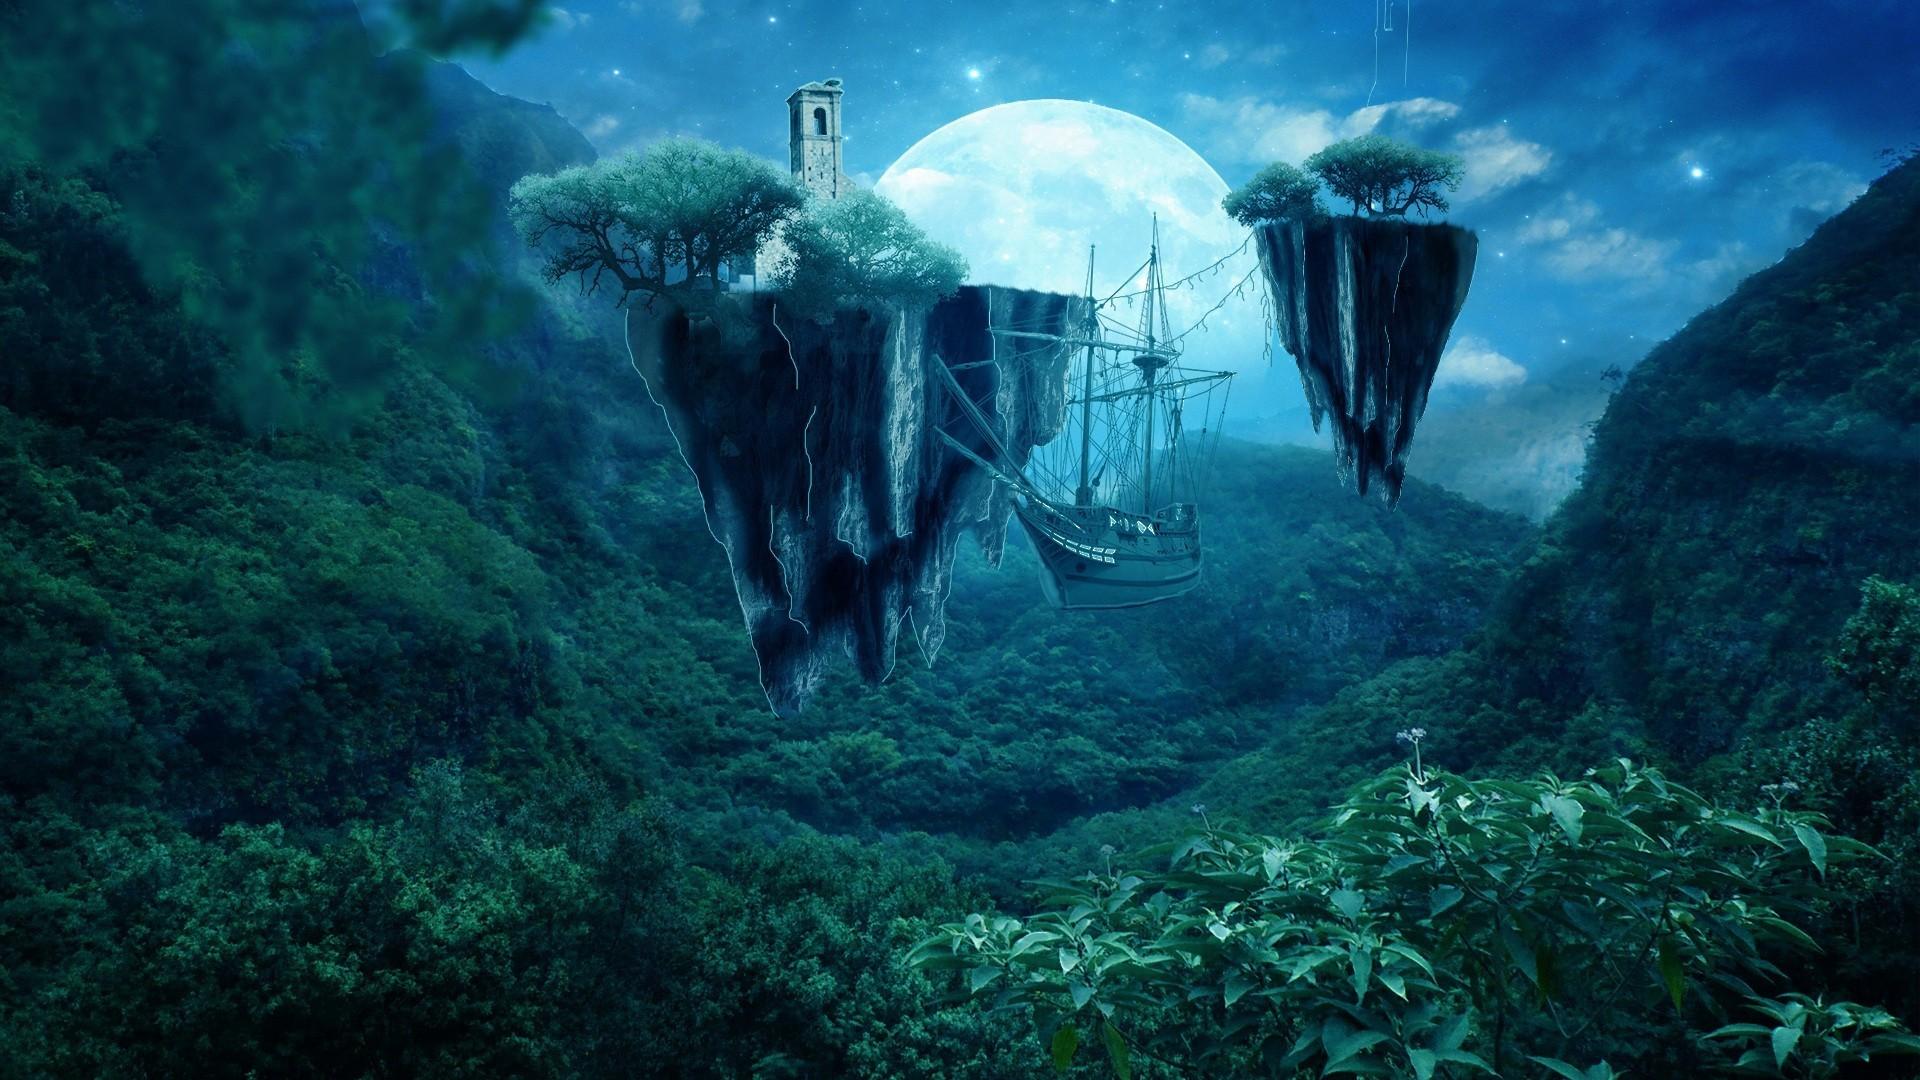 Res: 1920x1080, Fairytale Forest Desktop Wallpaper